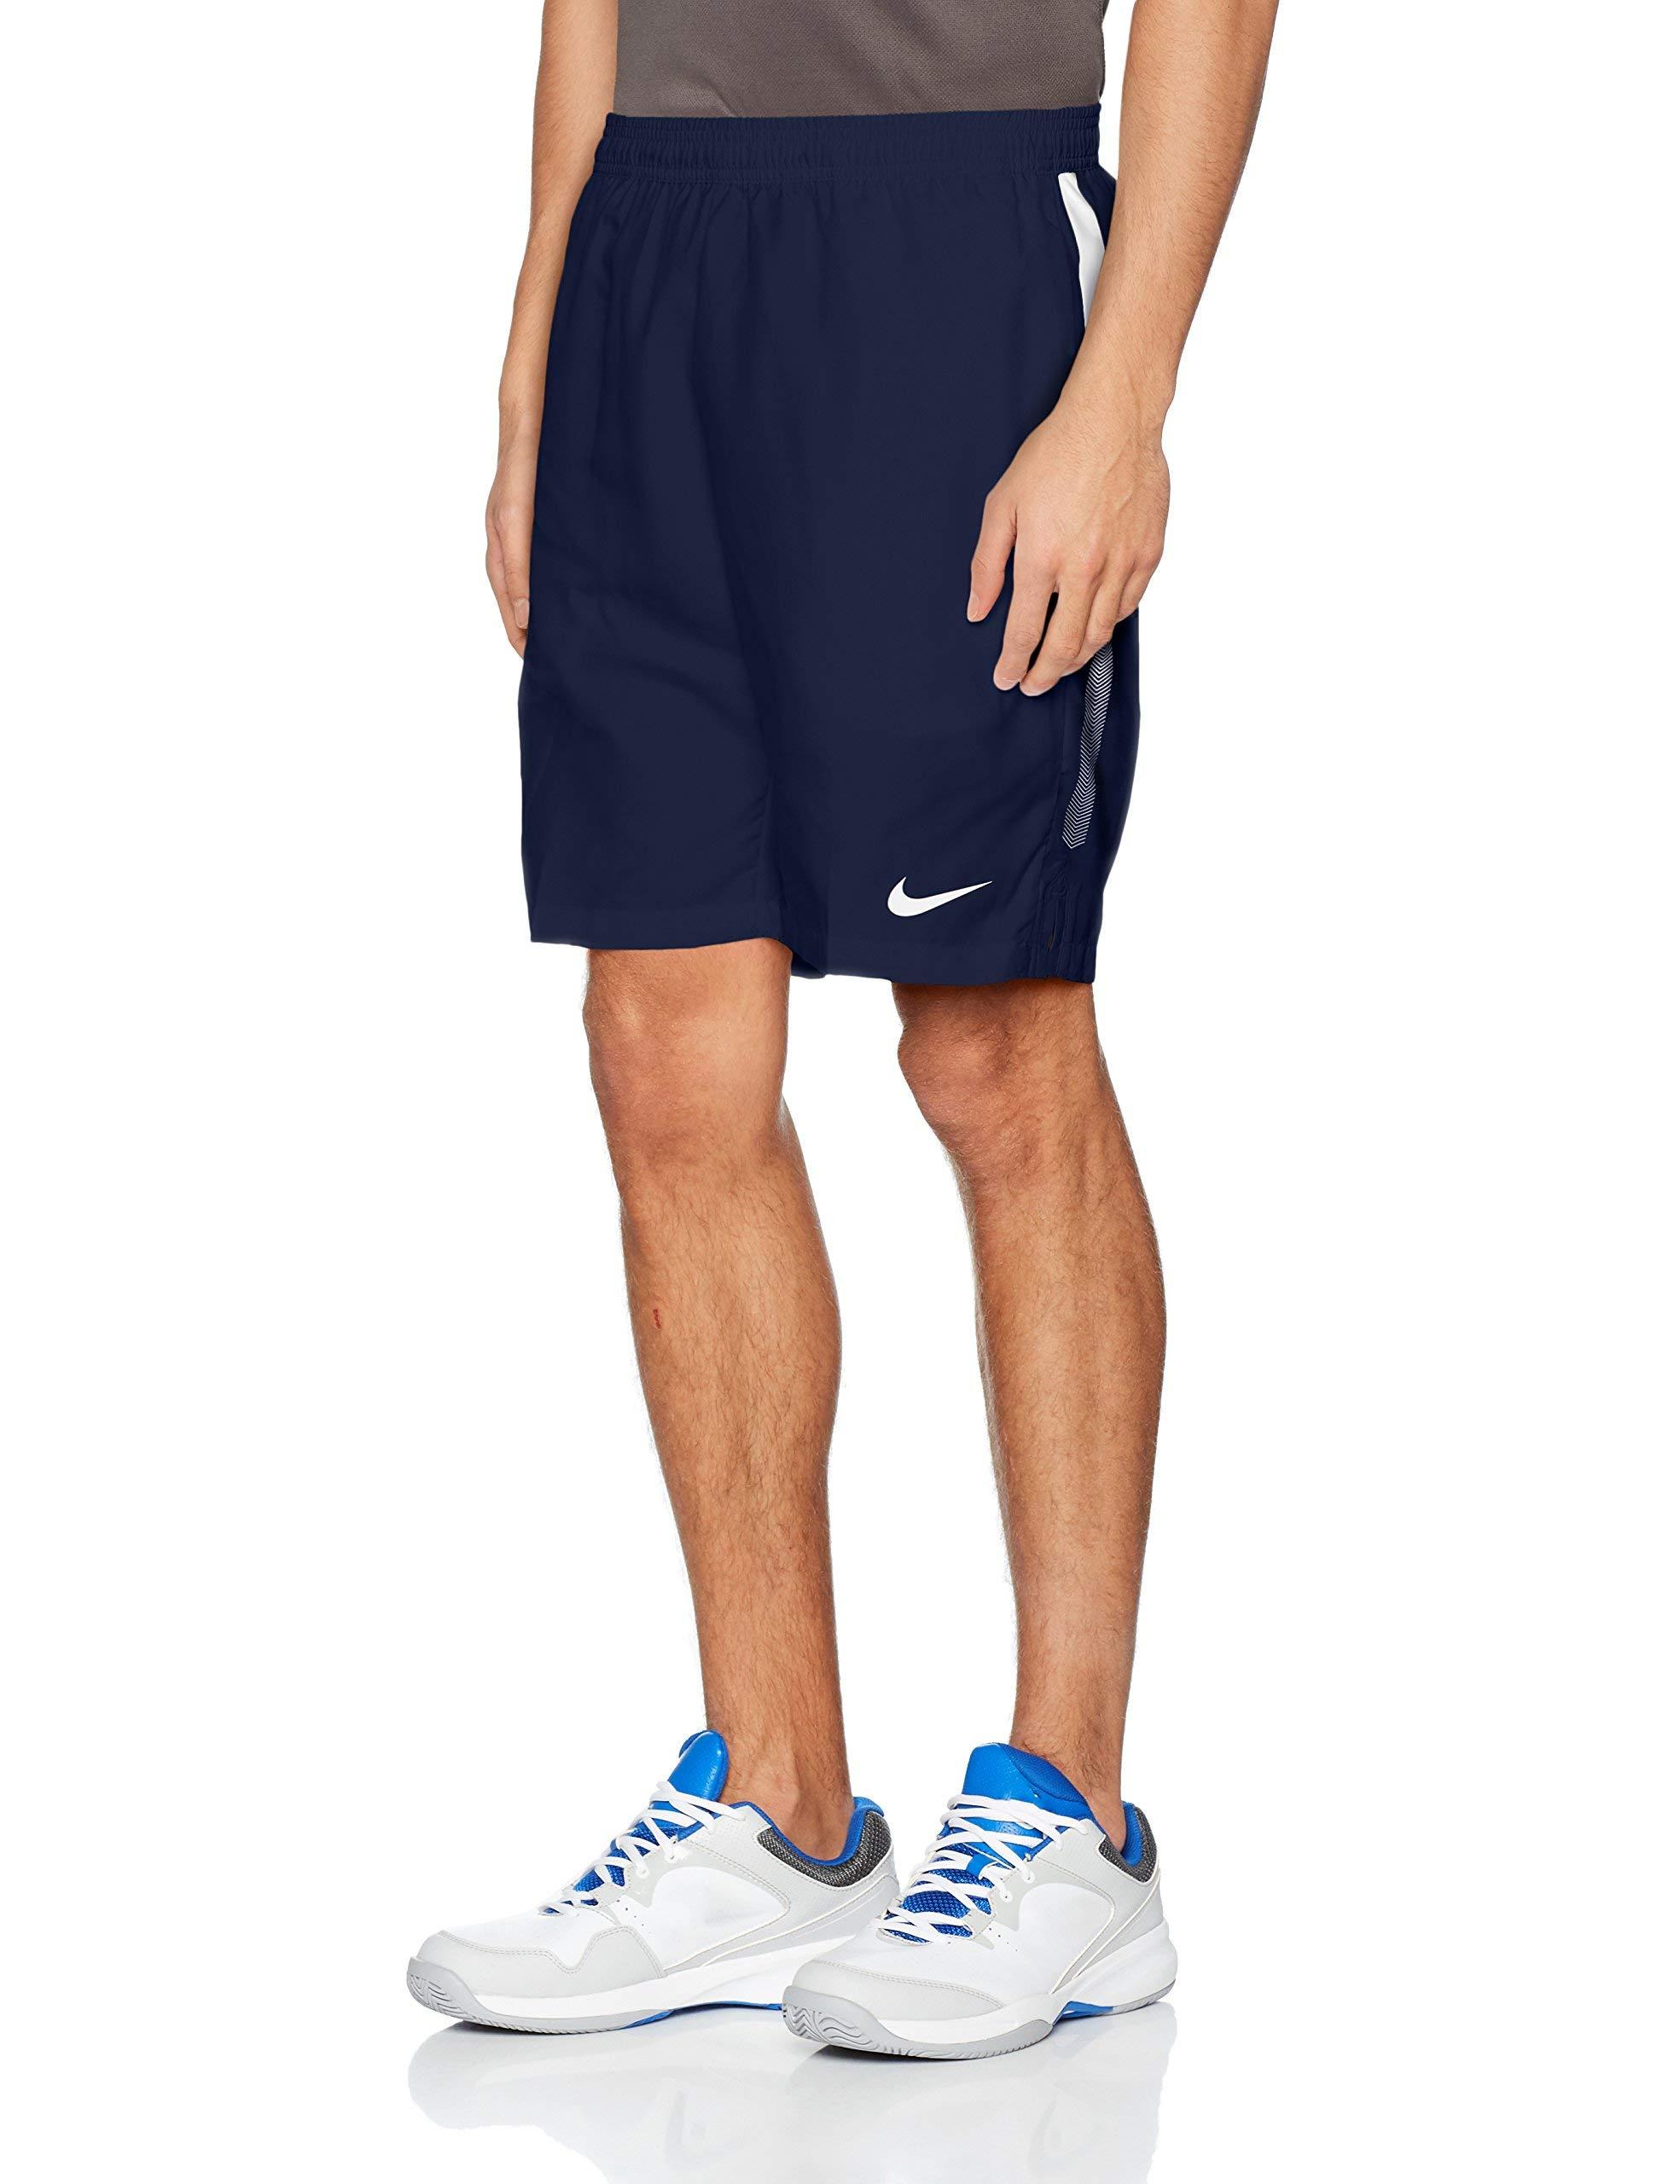 Nike Men's Court Dry 9'' Short (Midnight Navy/White/White, X-Small)